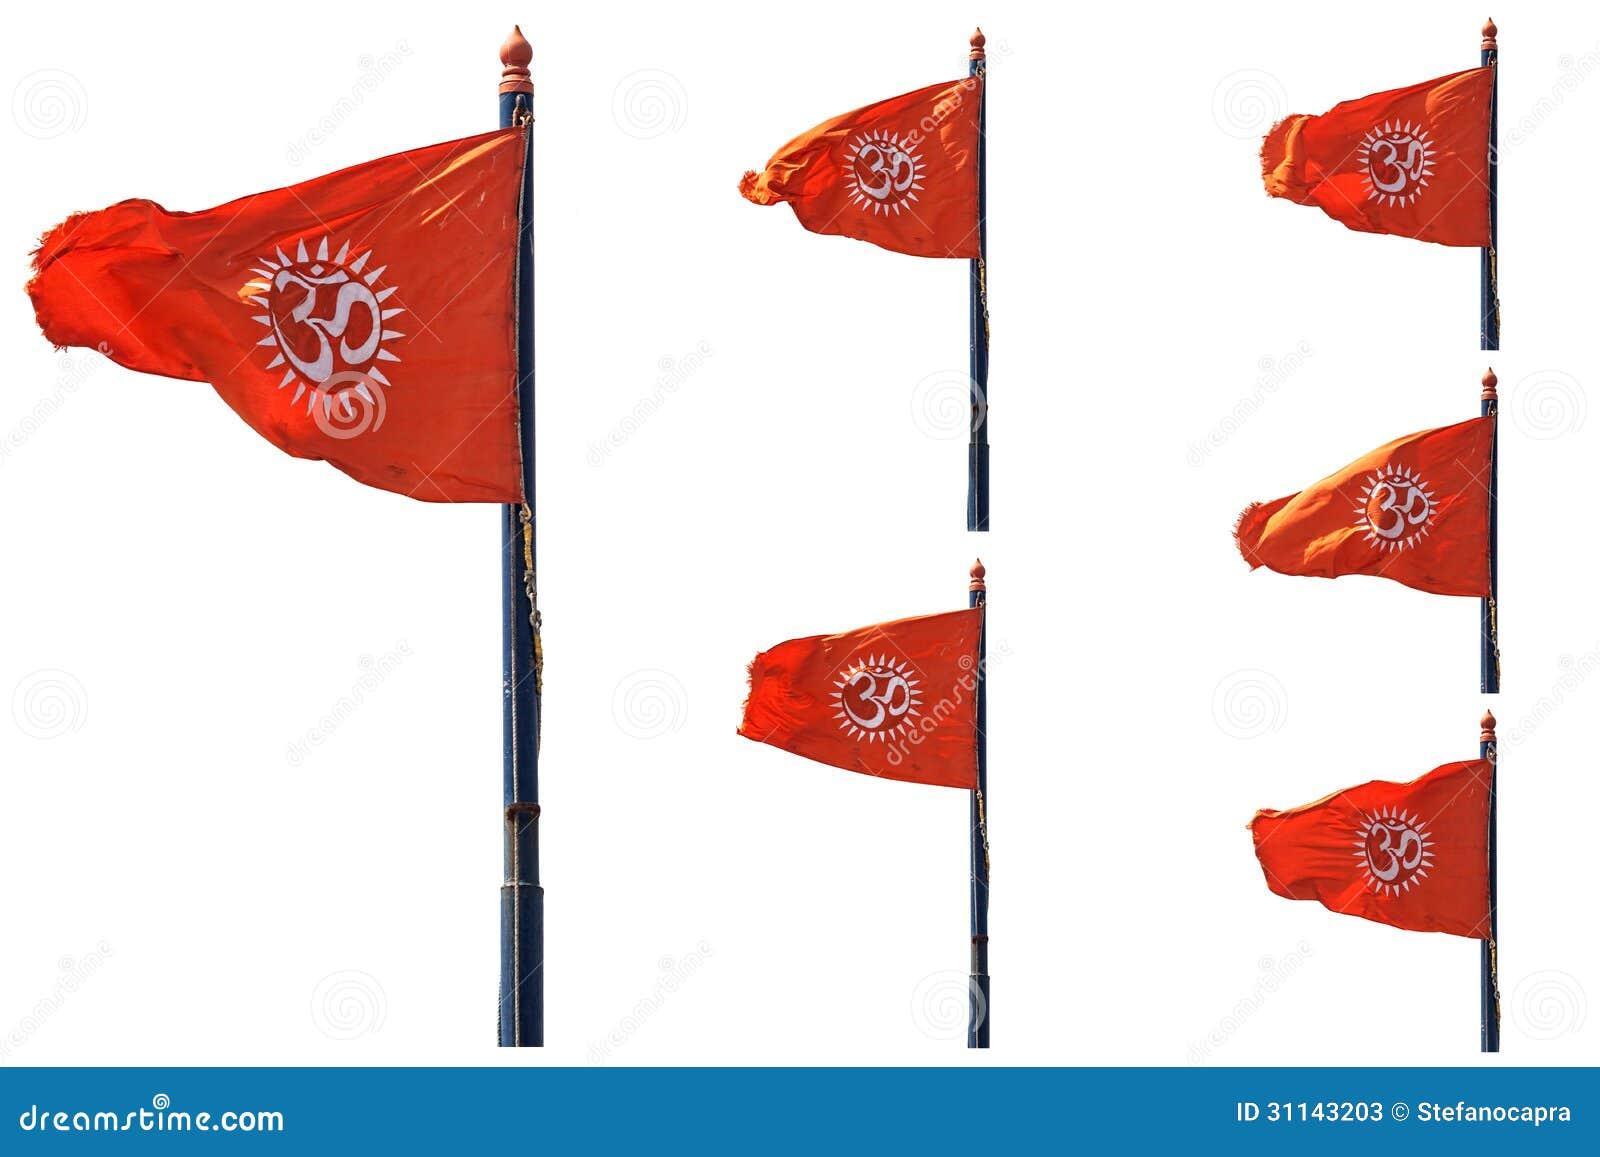 orange cove hindu dating site Orange county personals pets orange county personals popular dating site word match maker hot hindu women free dating florida.